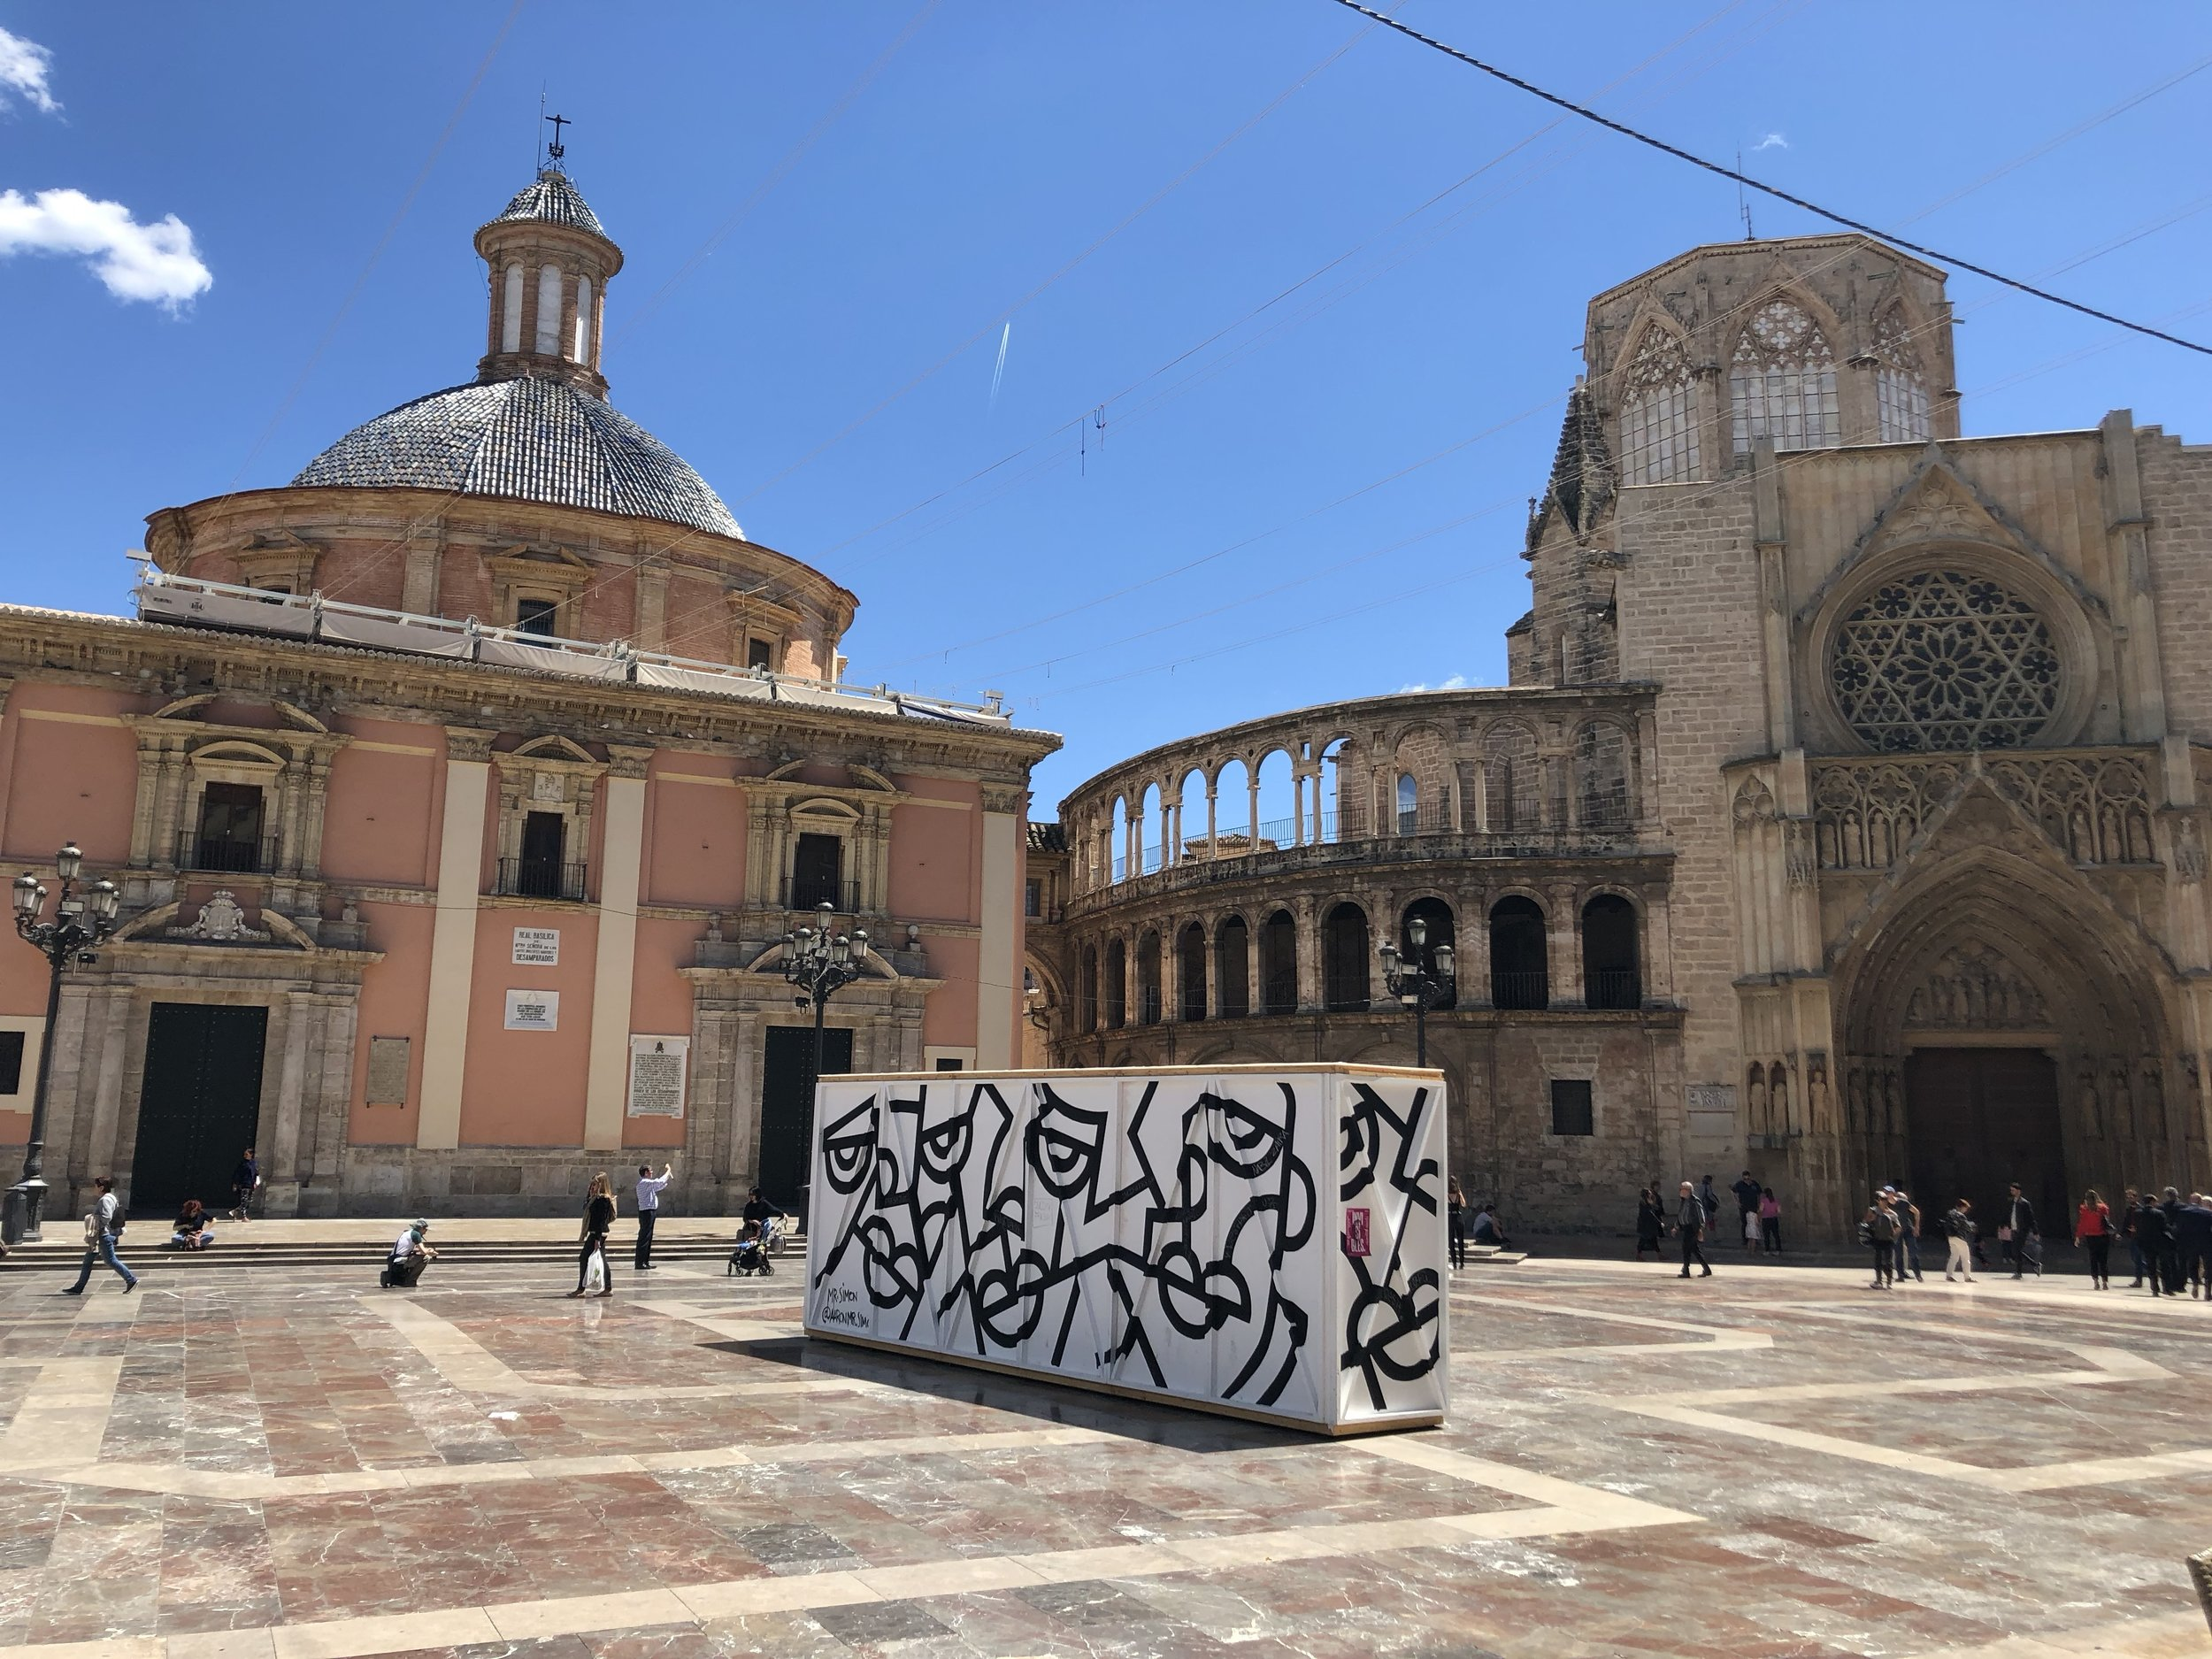 The Plaza de la Virgen was my favorite place to people watch.